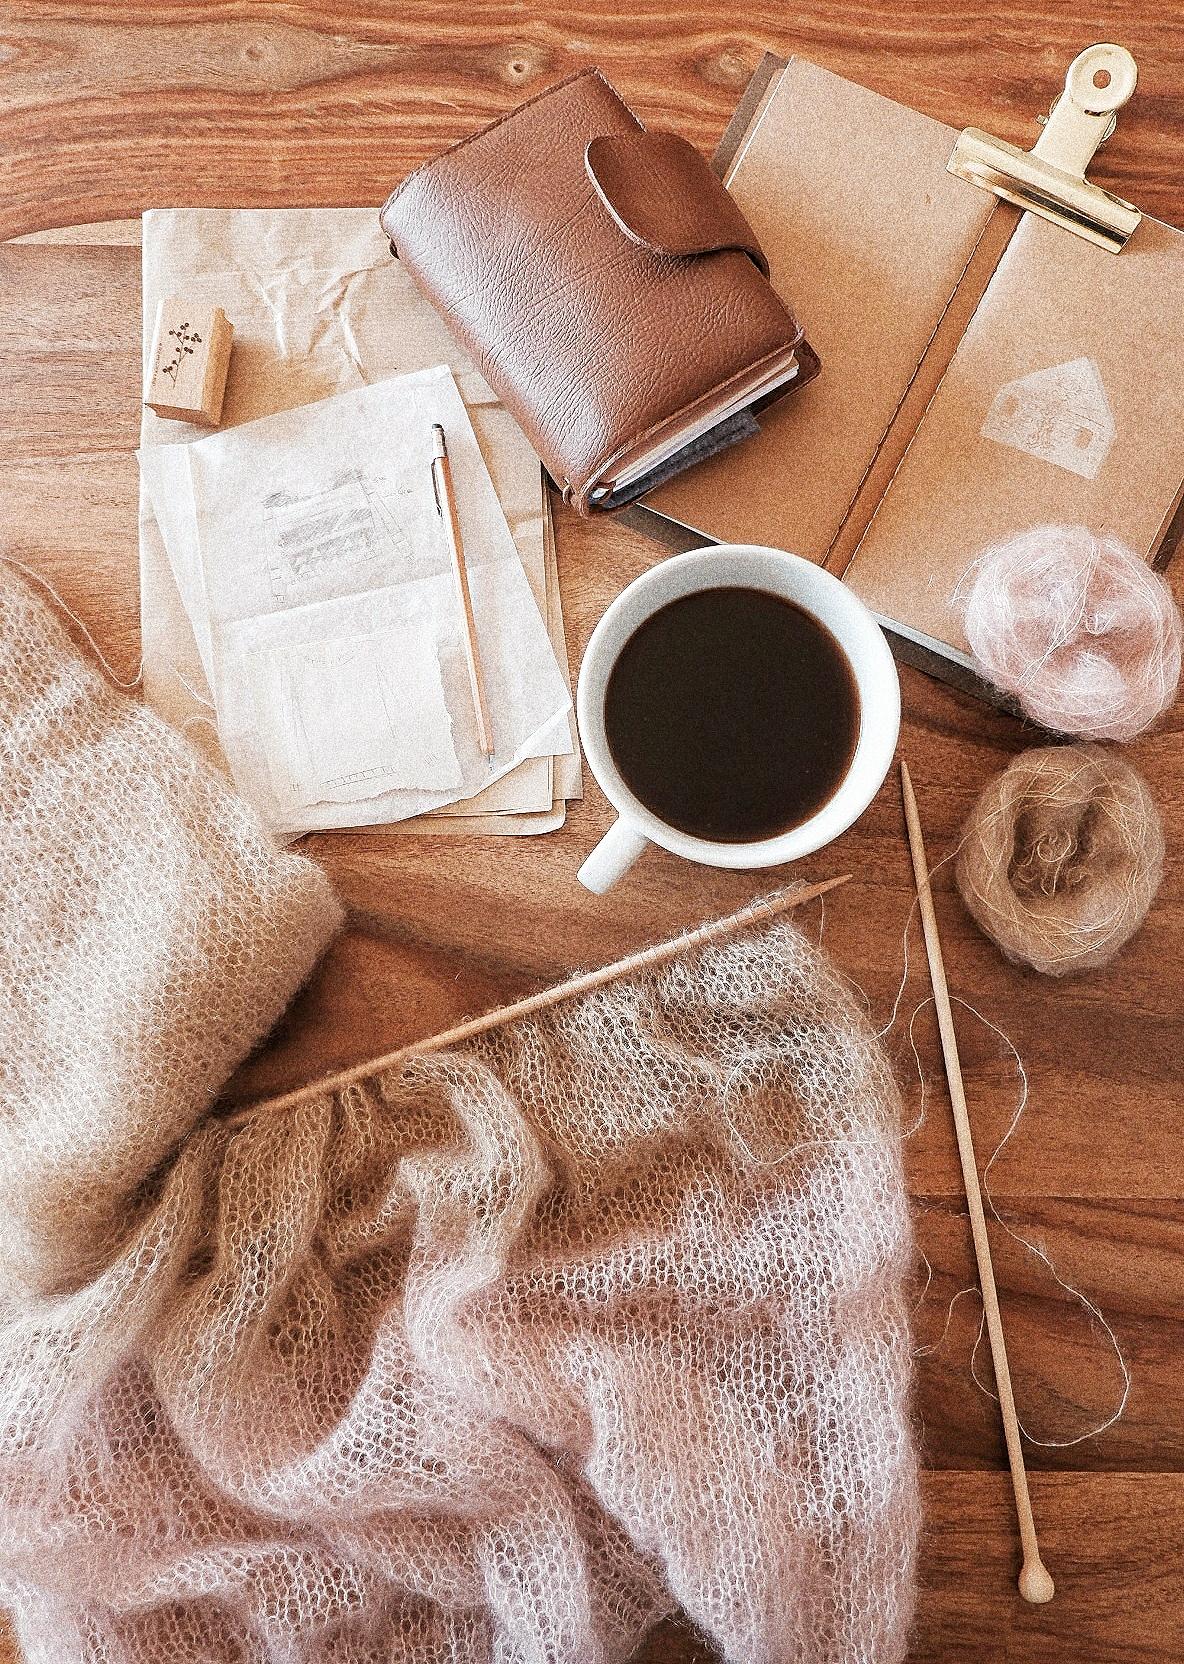 Delicate knitting work and journaling.  Lavoro a maglia delicato e soffice e journaling.